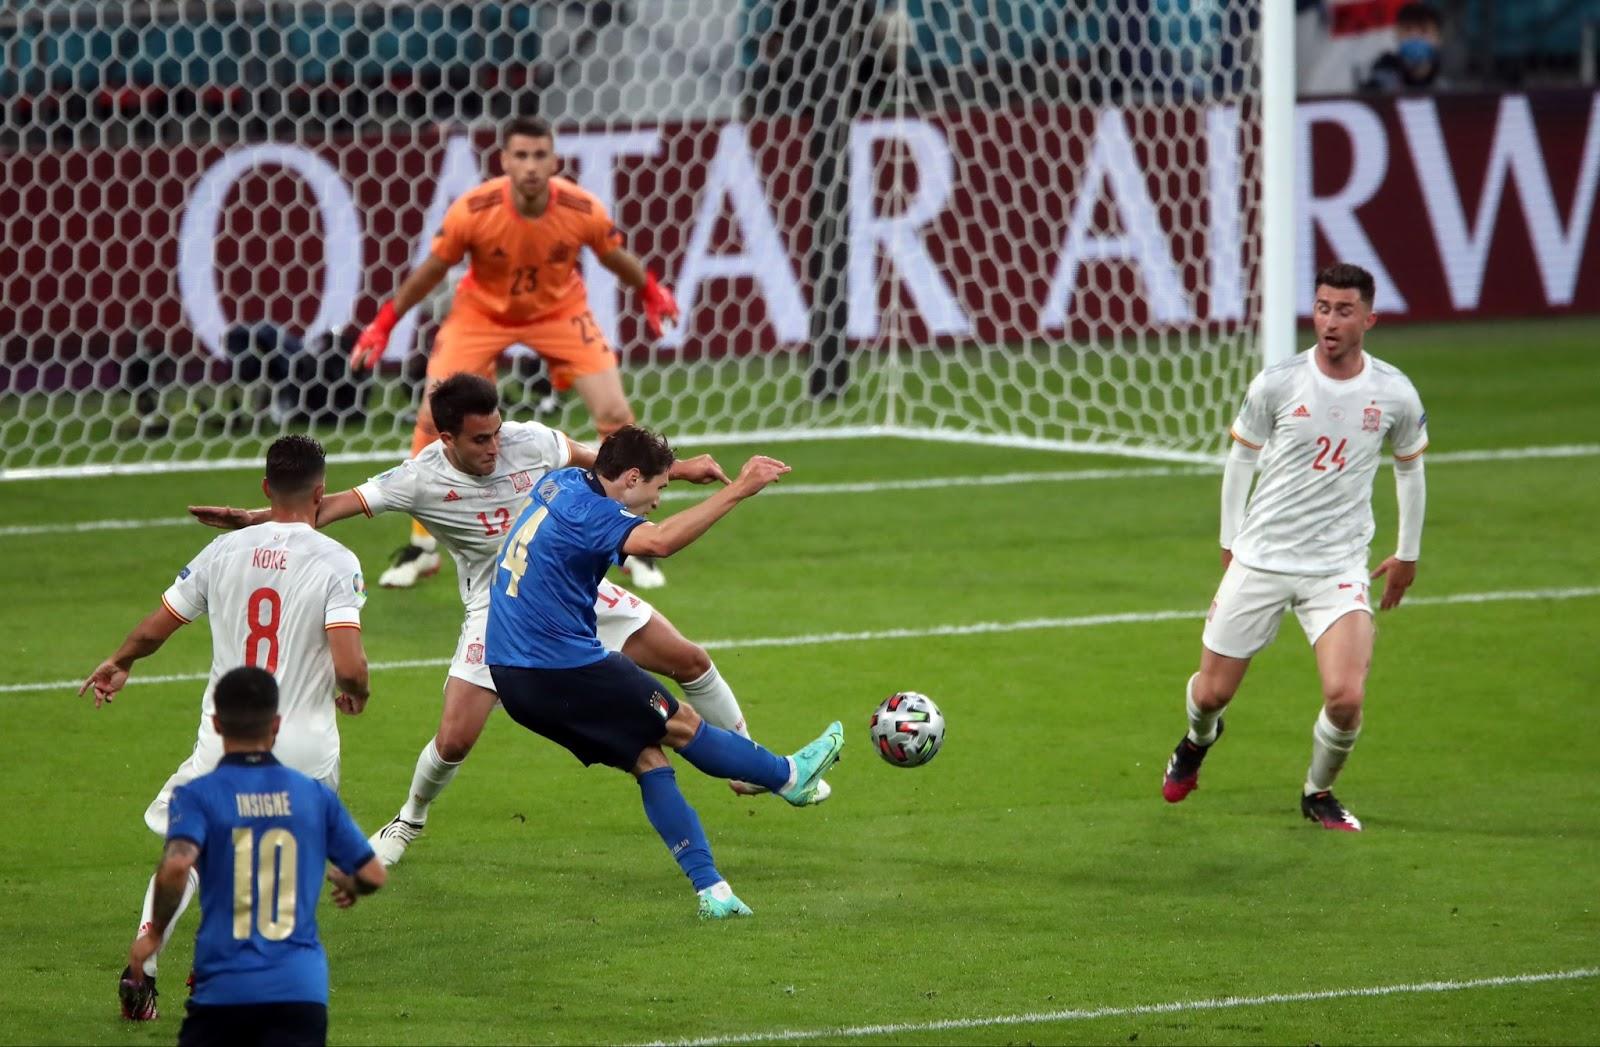 Chiesa curls the ball past Unai Simon